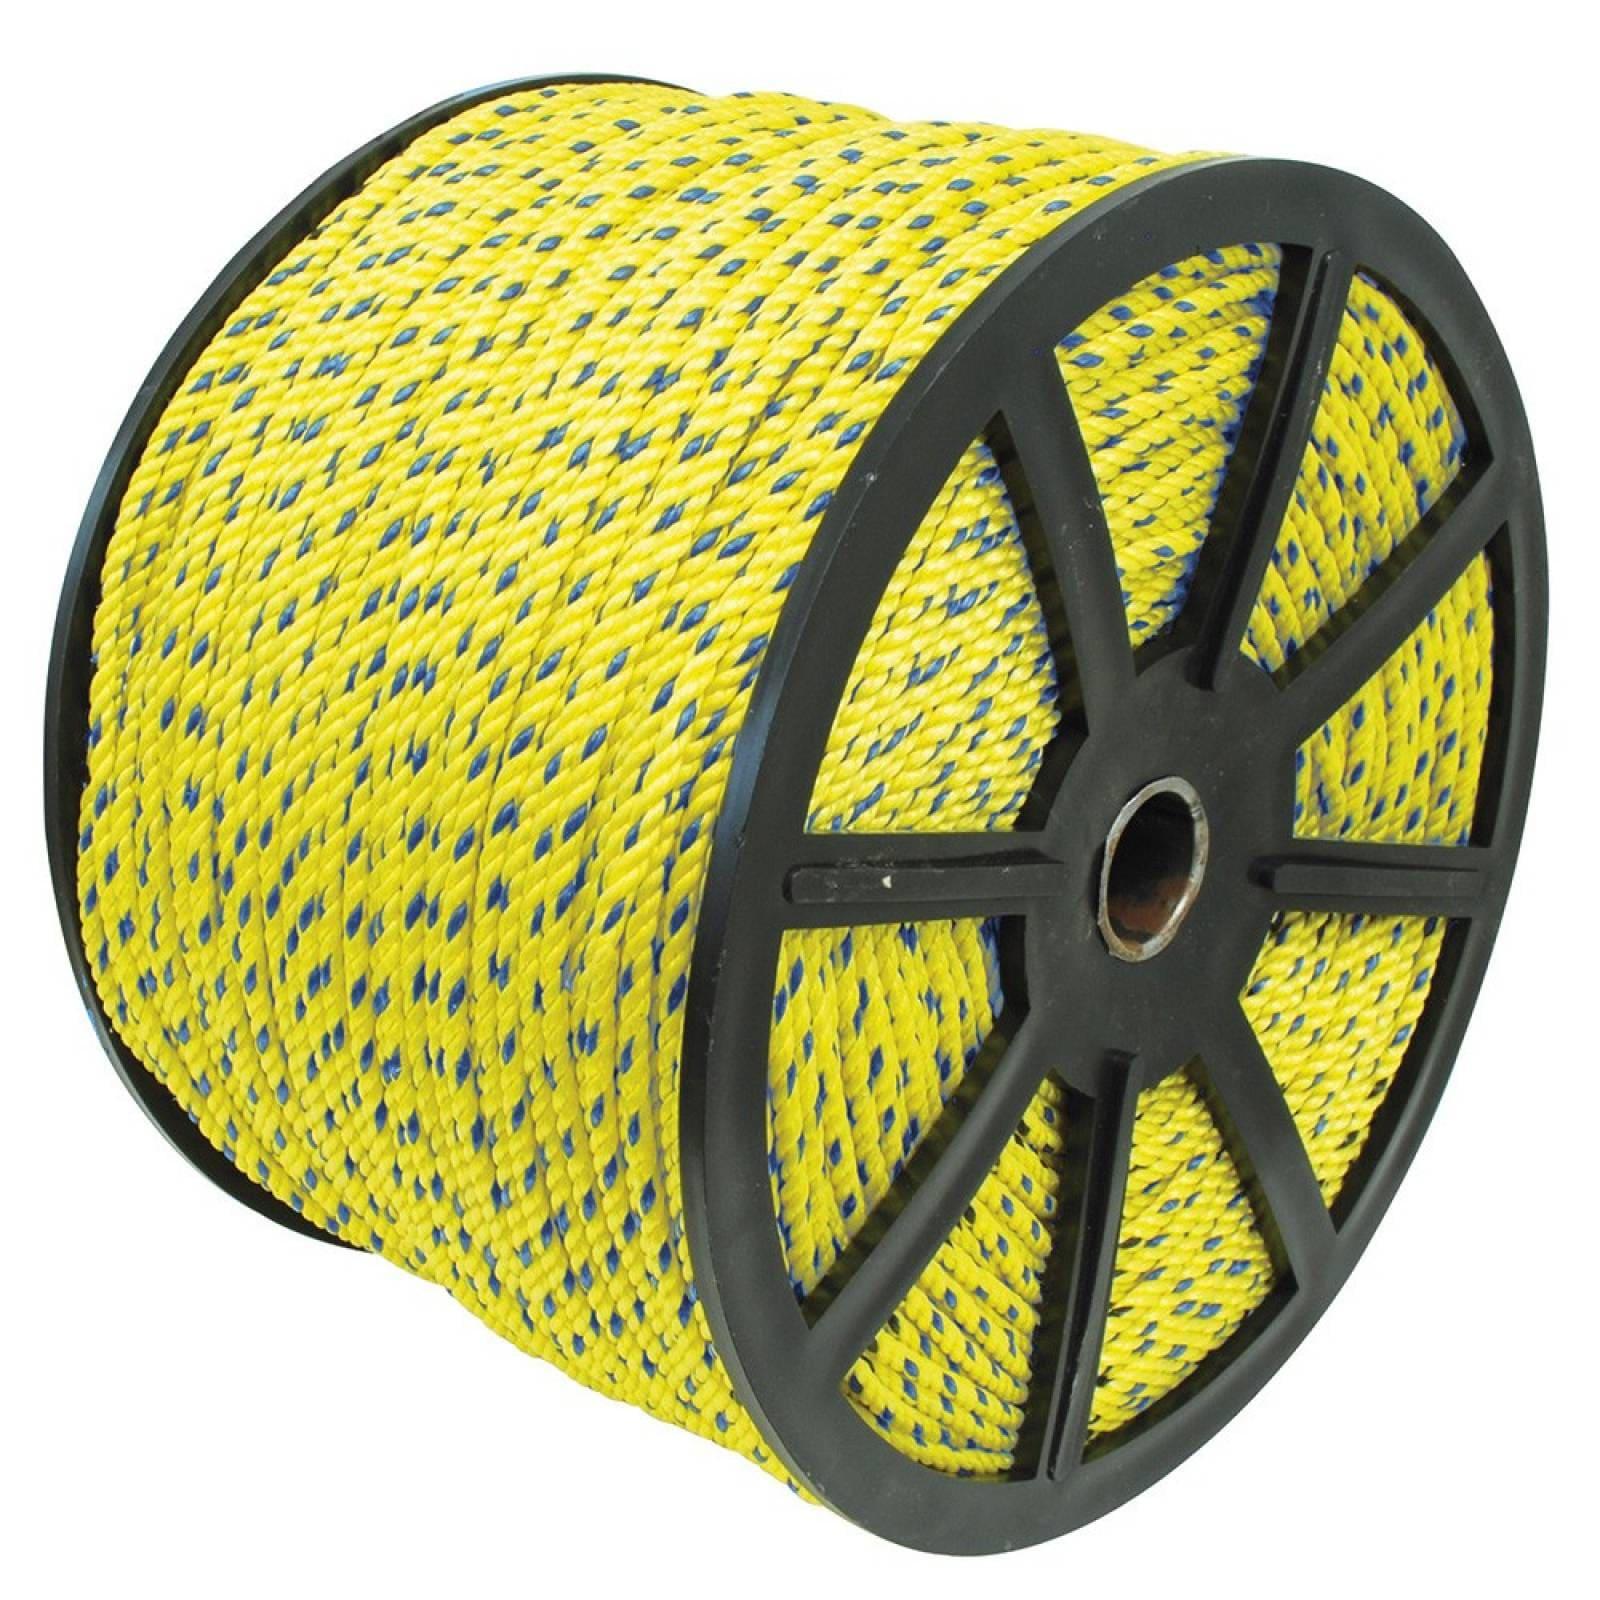 Cuerda de polipropileno 13 mm, 31 kg 138205 Surtek